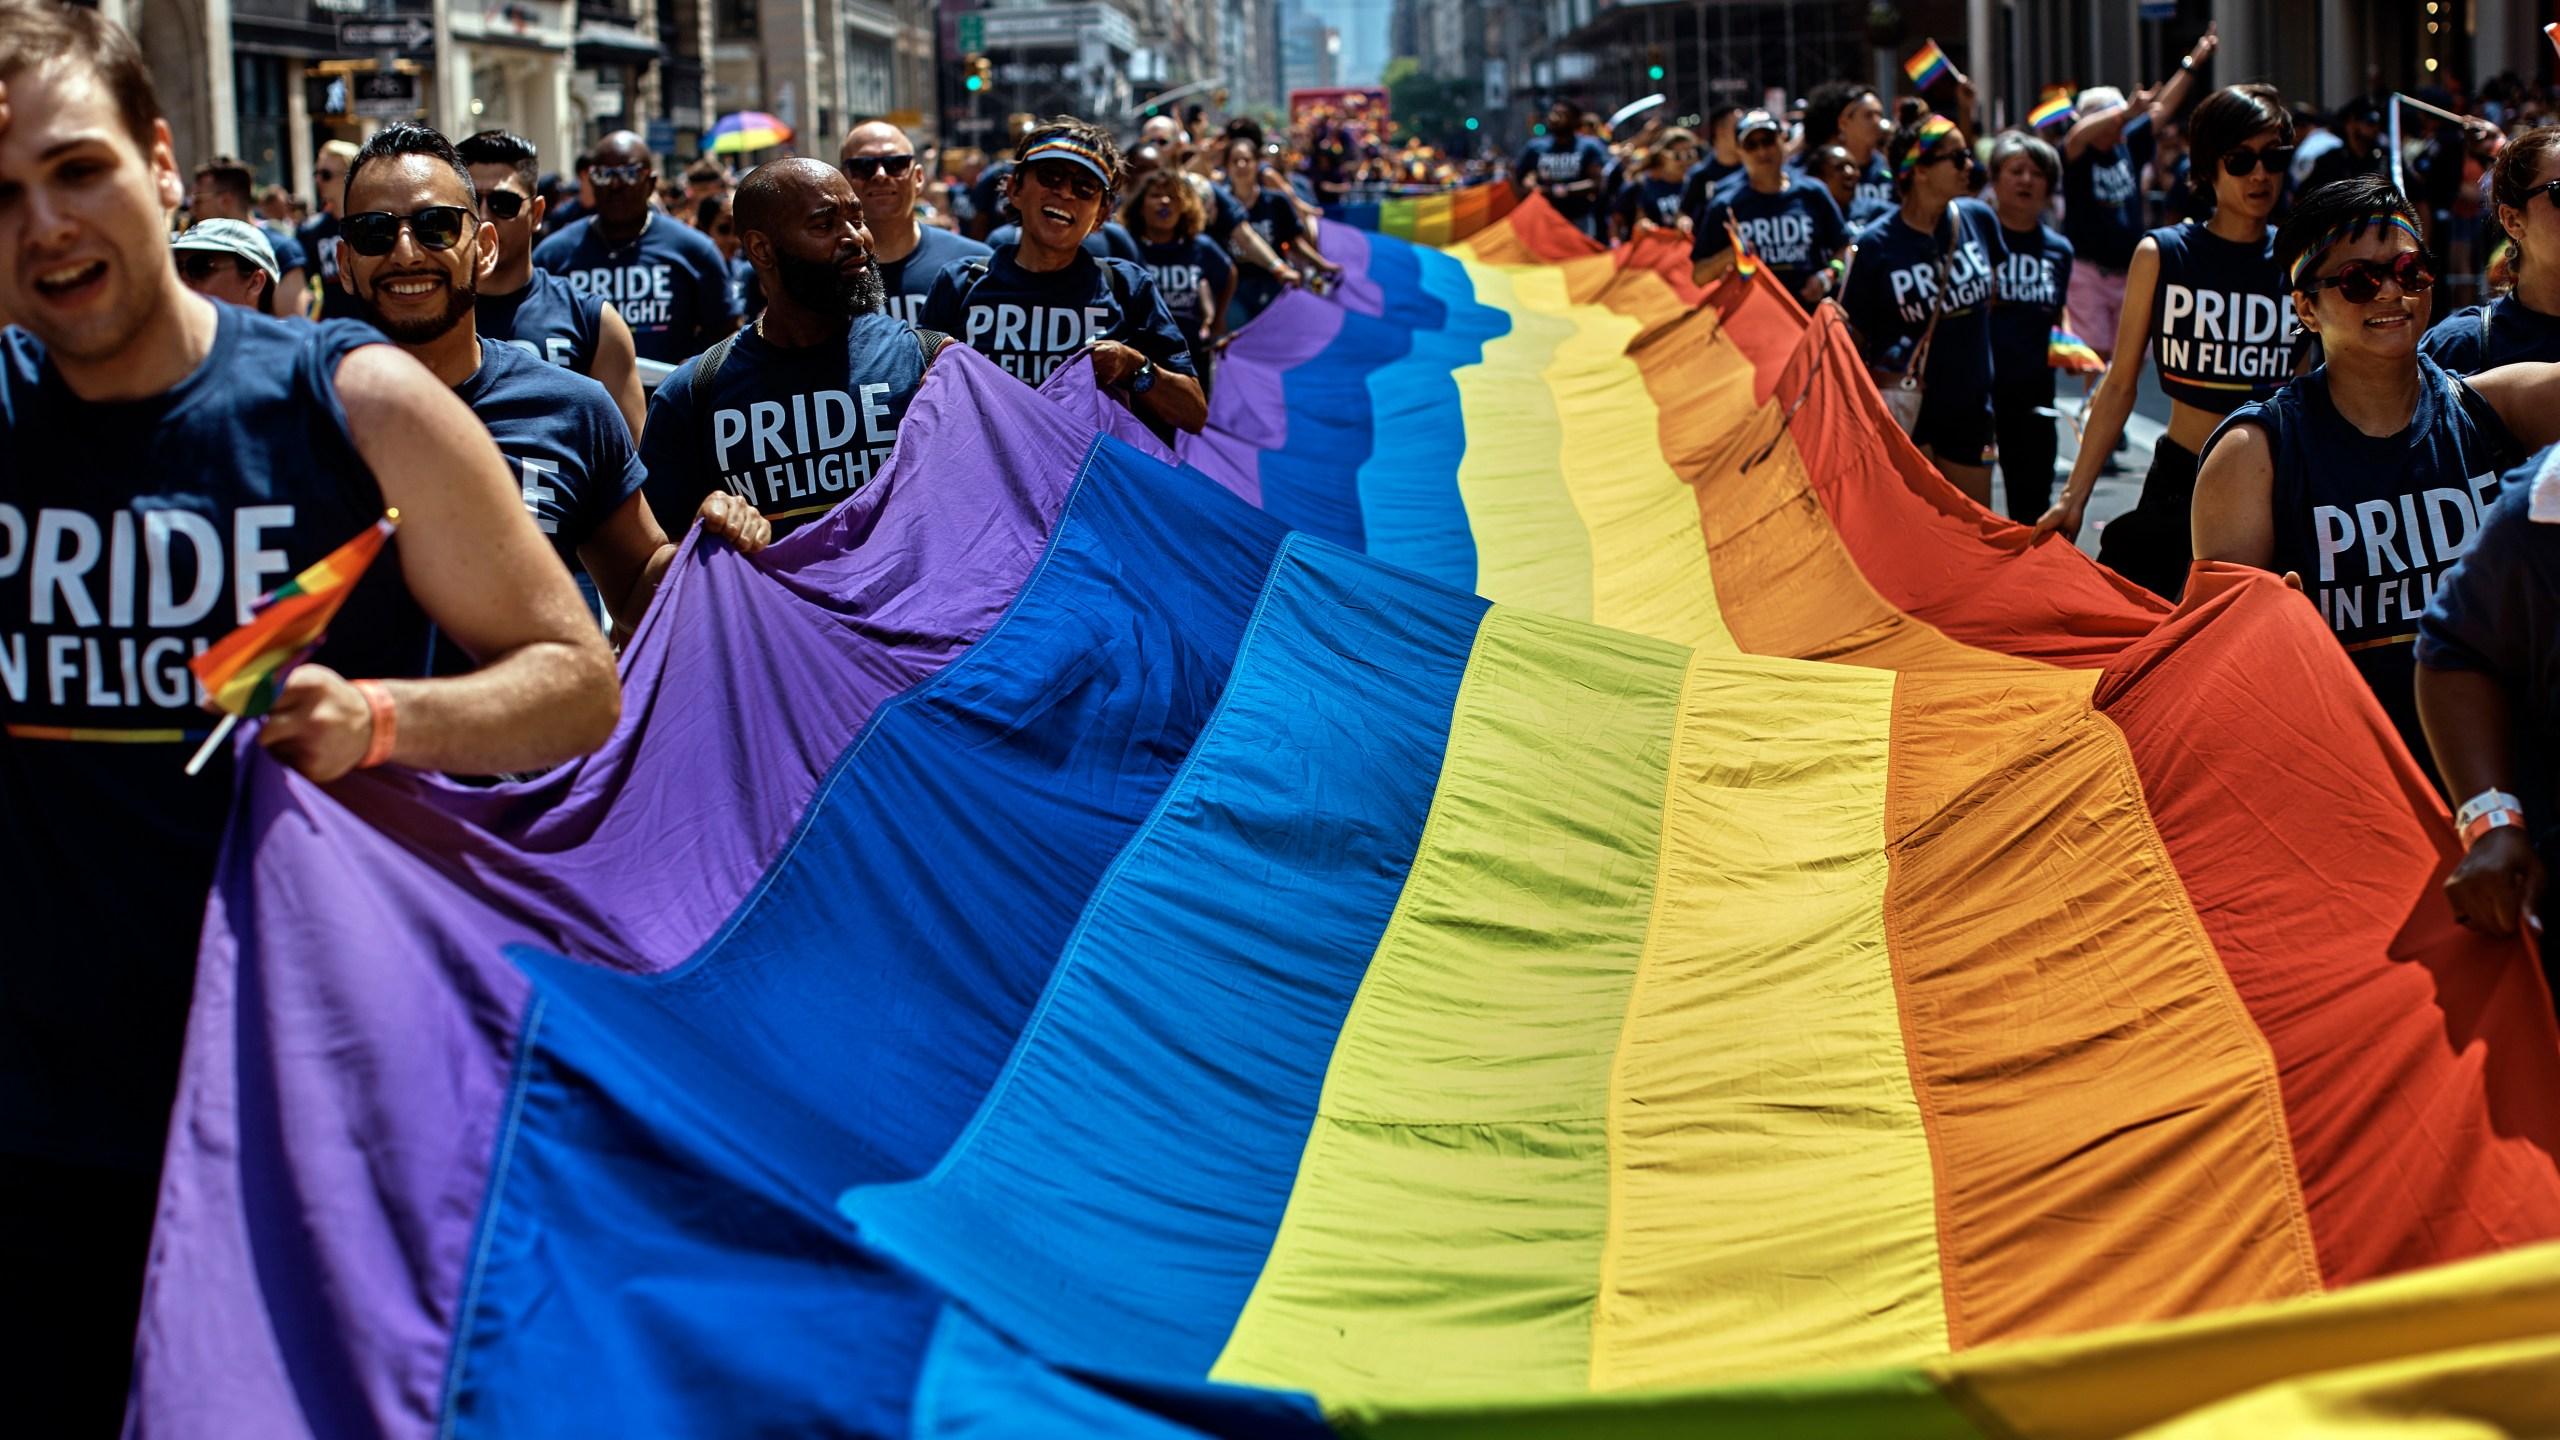 Stonewall_At_50_Pride_Month_94384-159532.jpg32477201